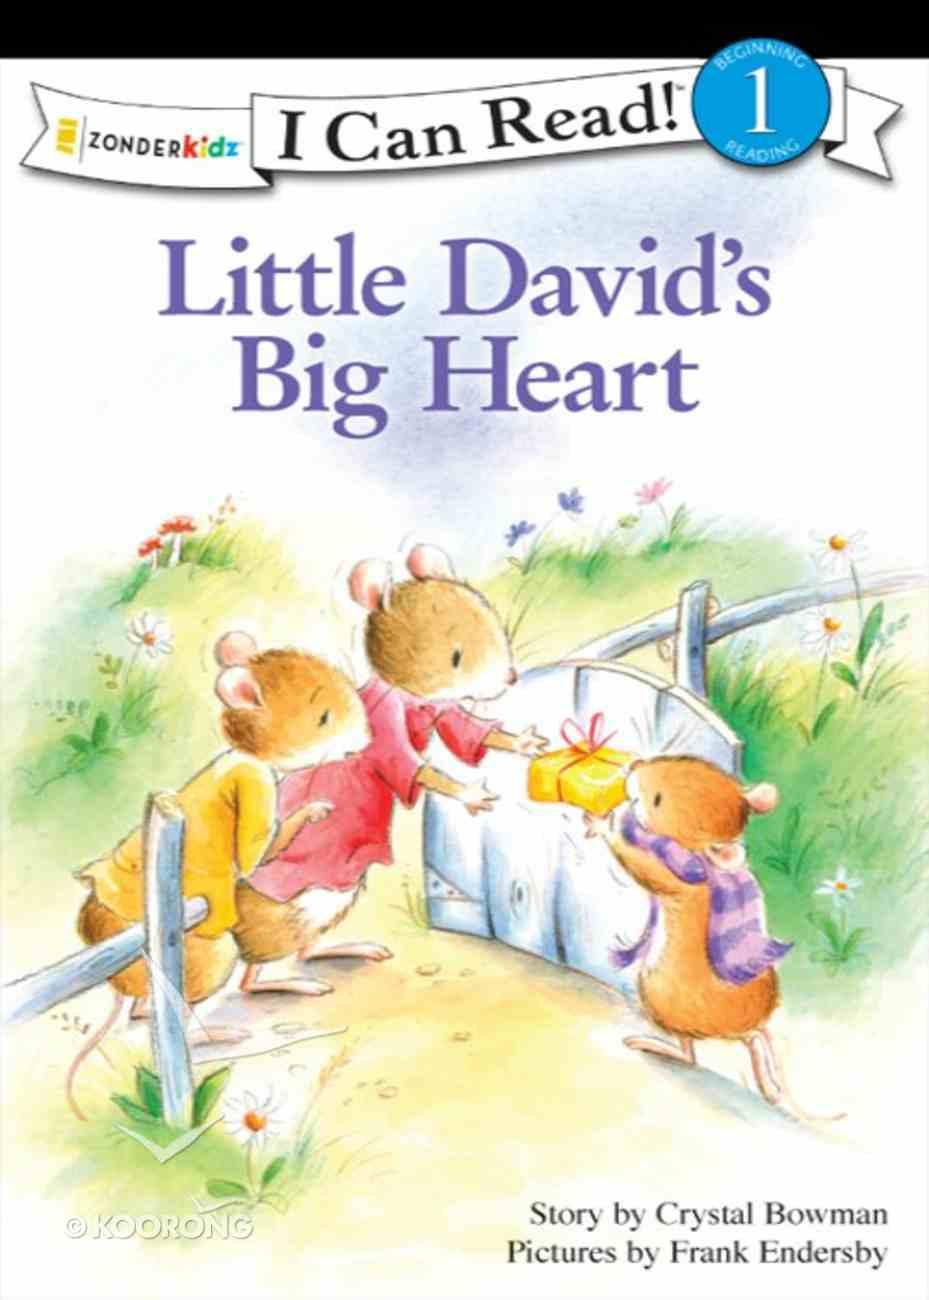 Little David's Big Heart (I Can Read!1/little David Series) eBook